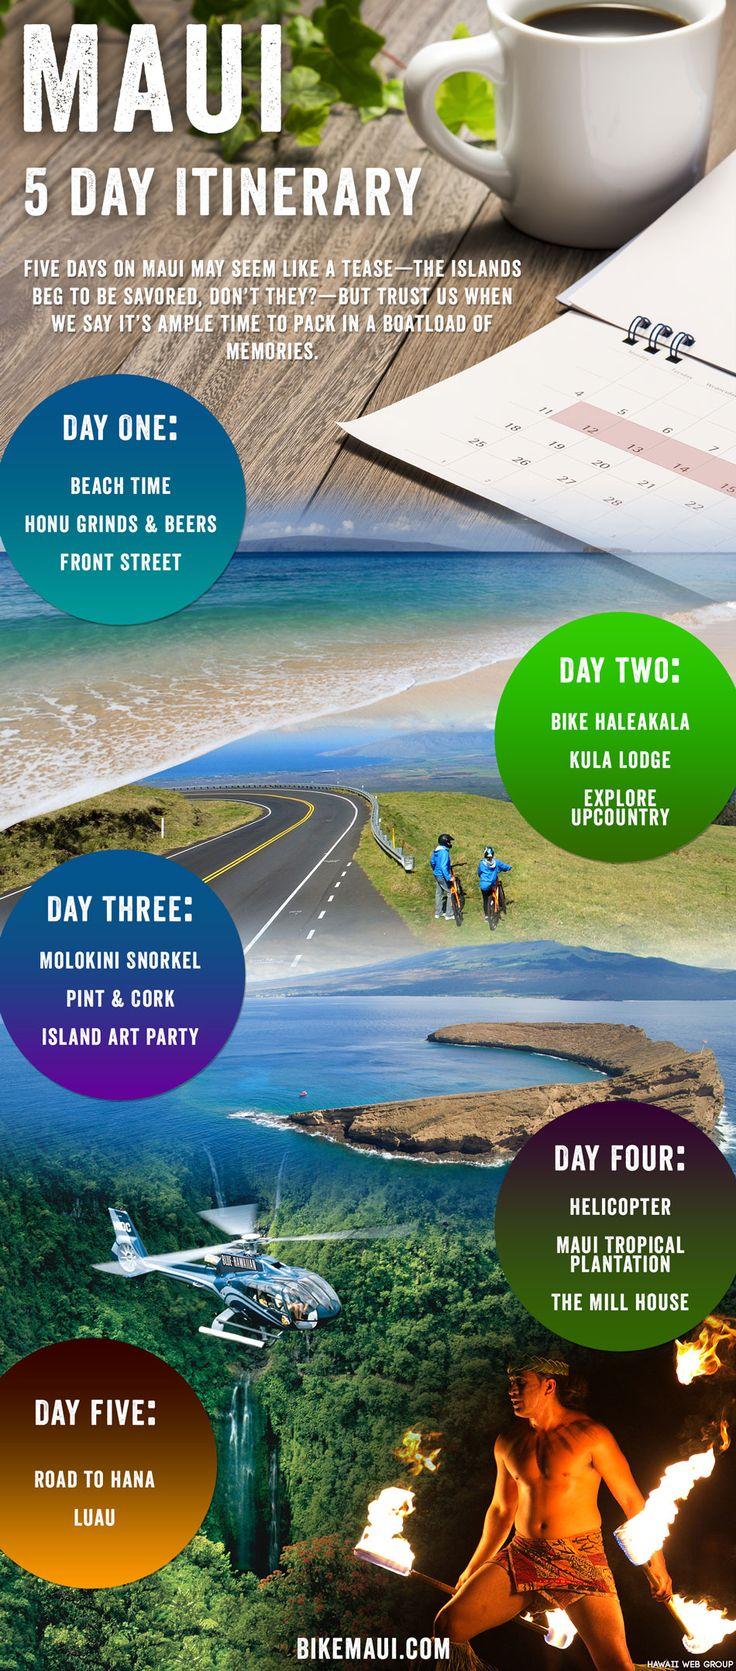 5-Day Maui Itinerary